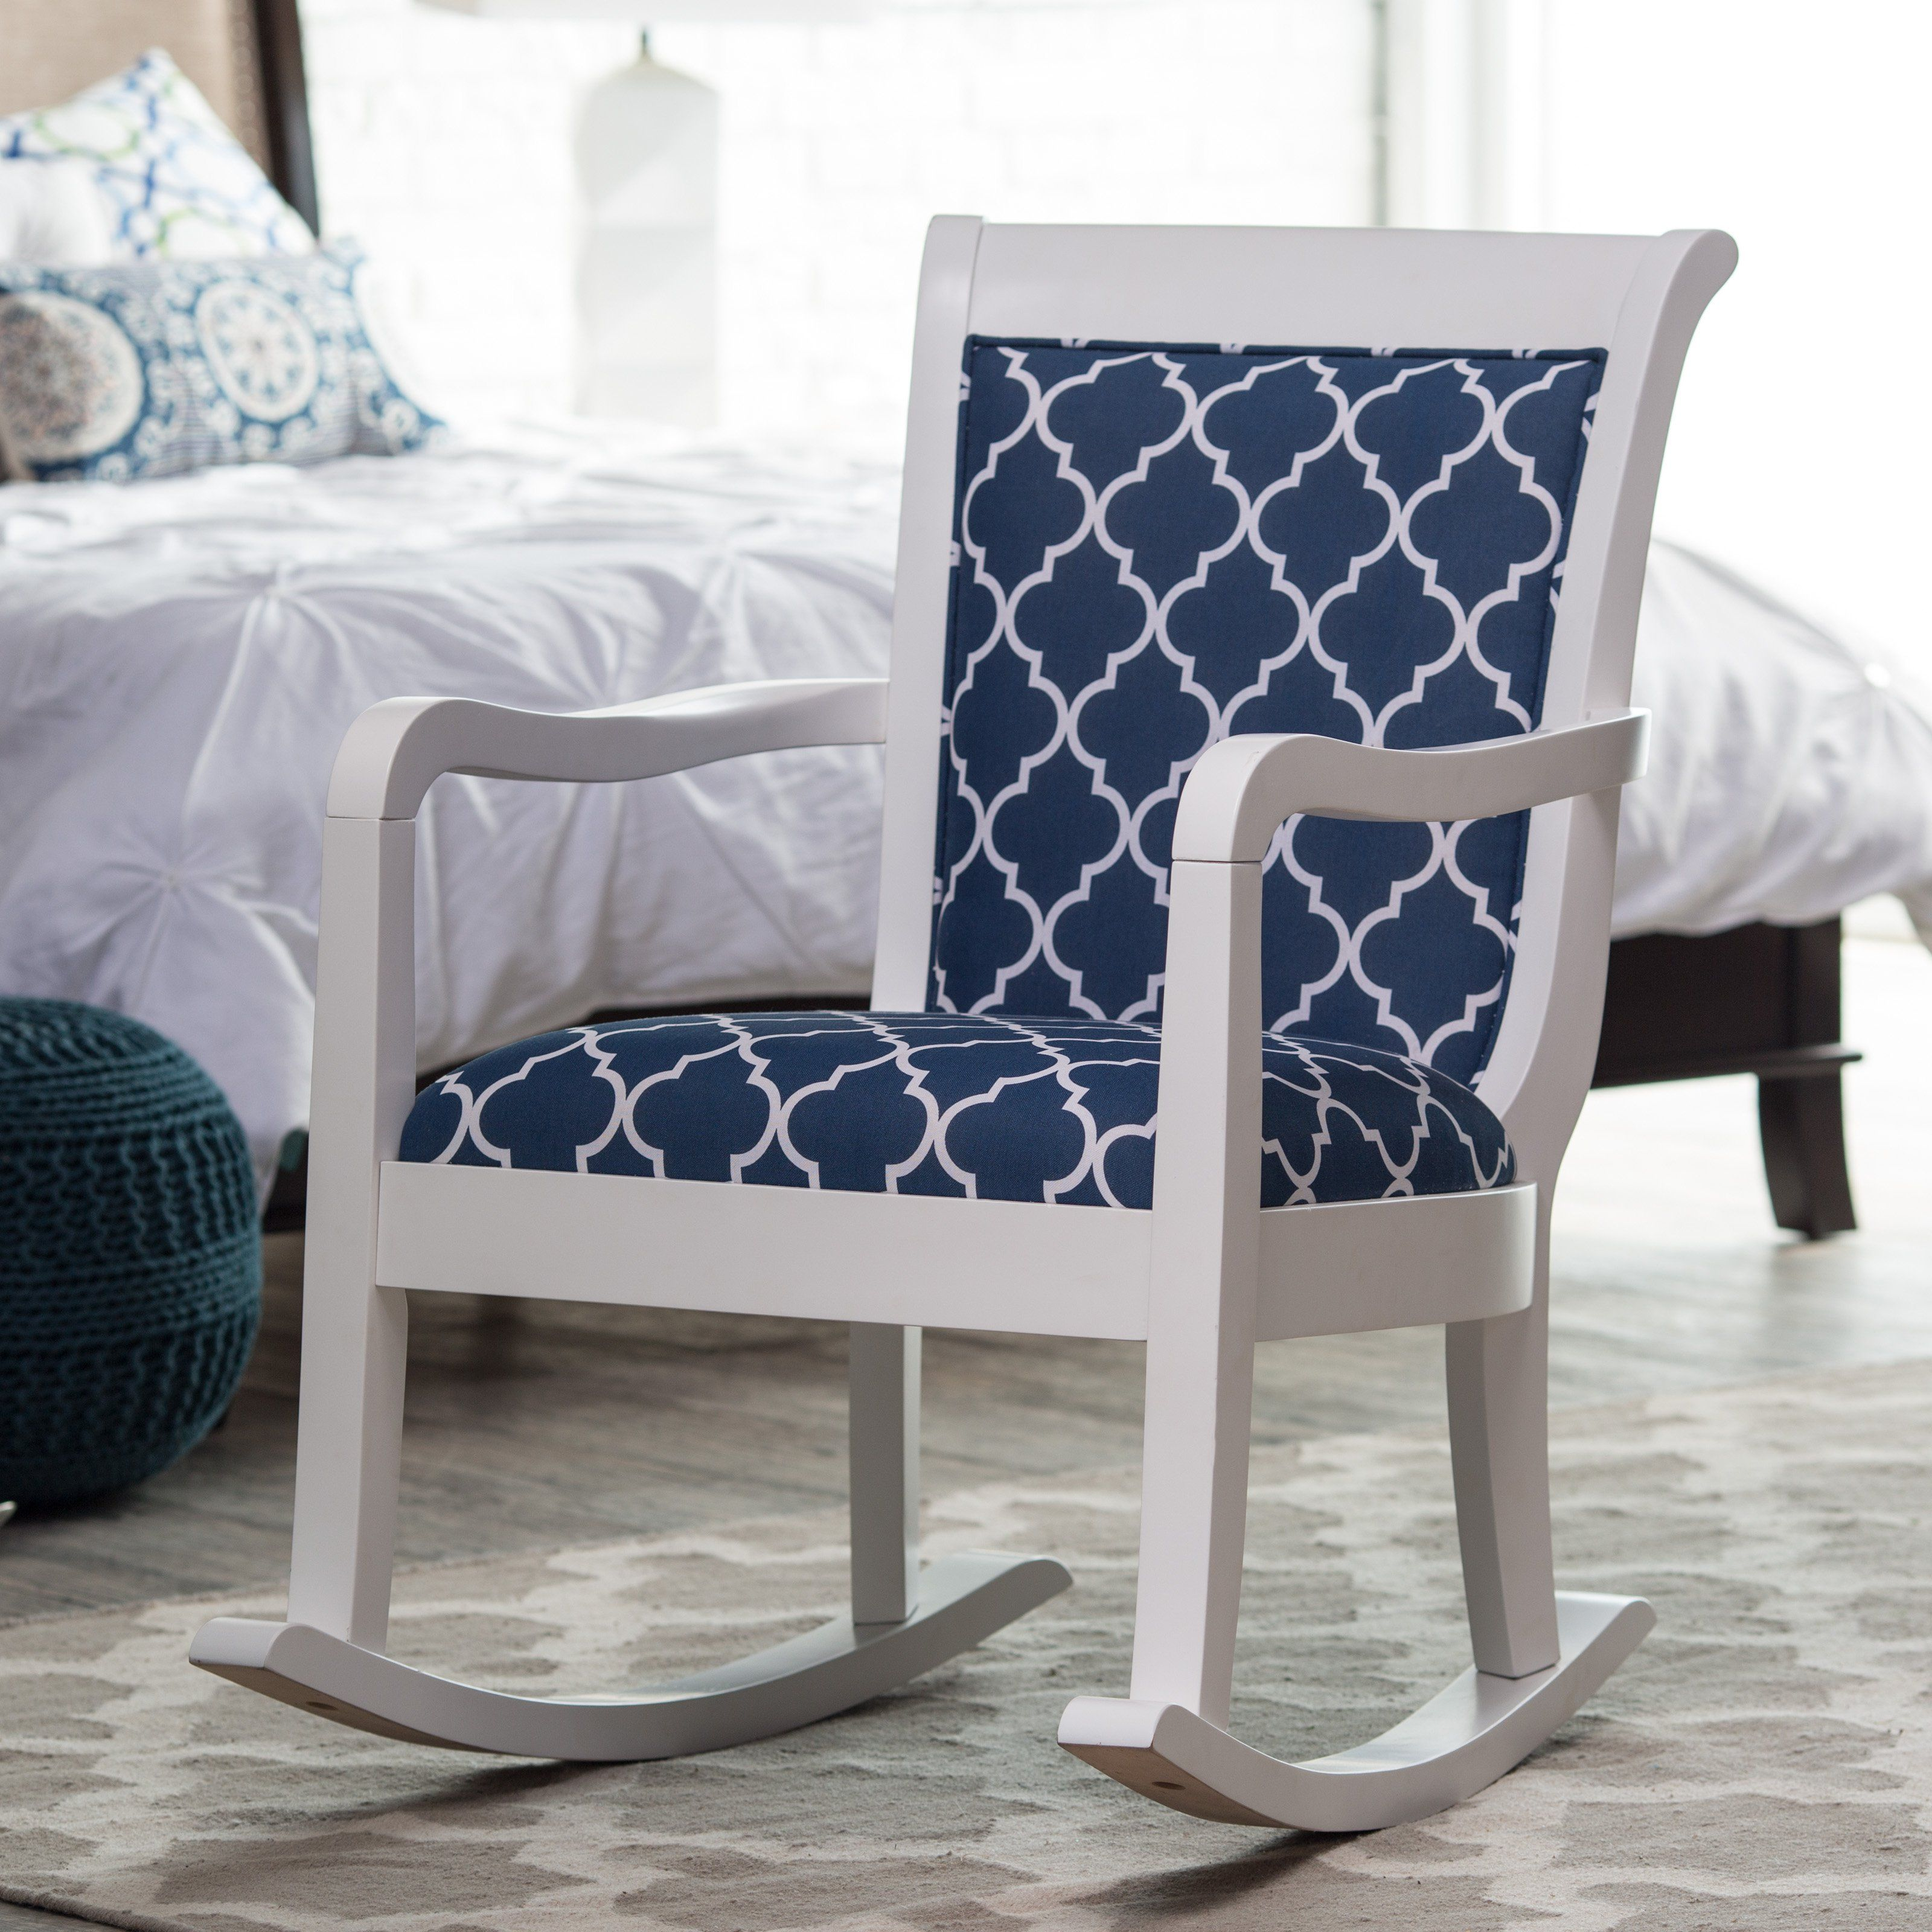 Belham Living Blue Quatrefoil Rocking Chair The Belham Living